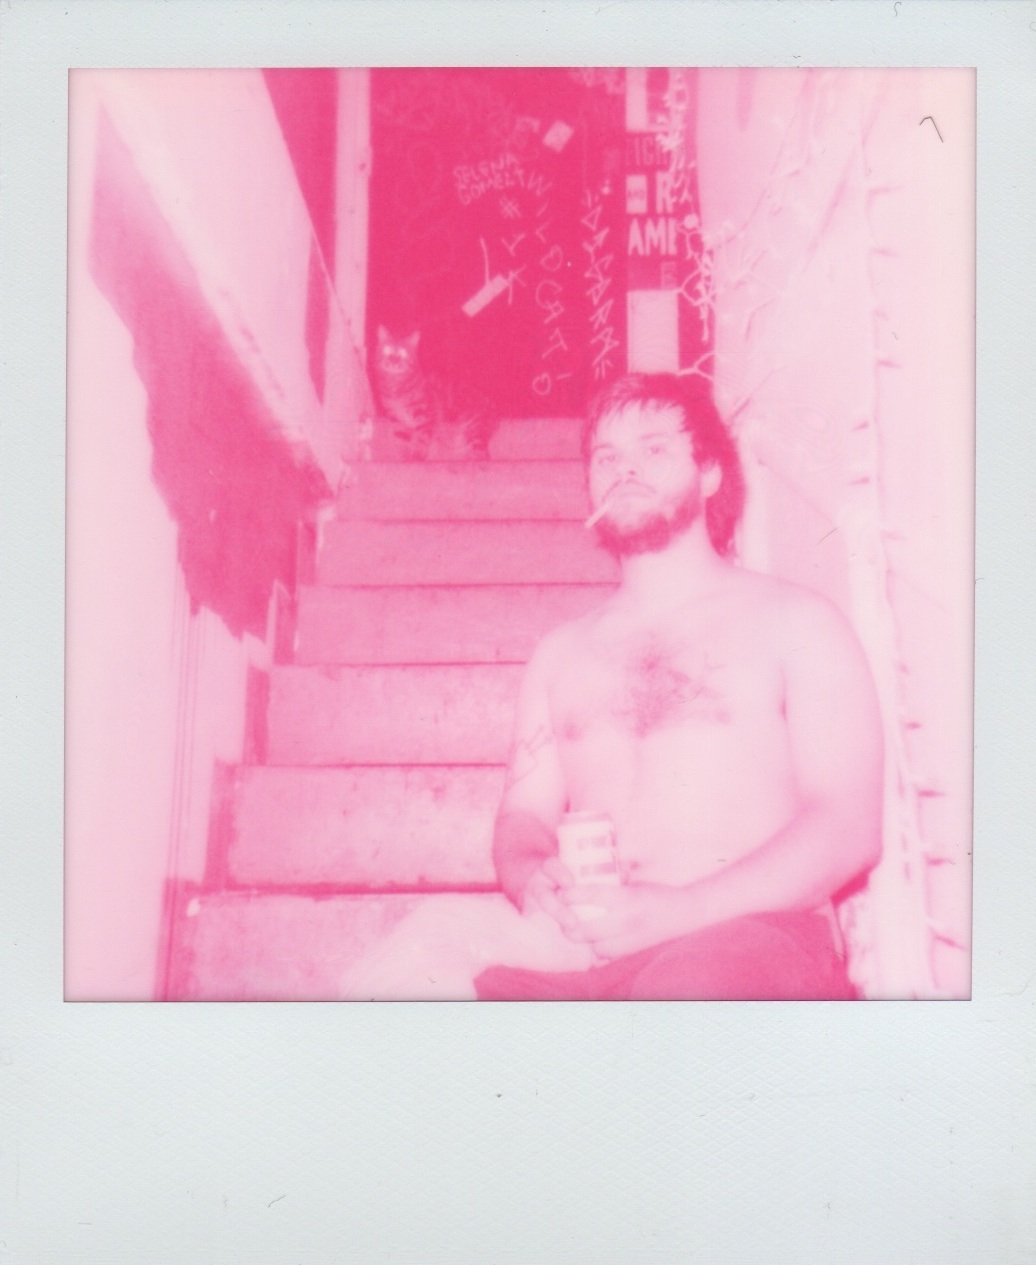 Pink Stove Aviv by Bob Reich